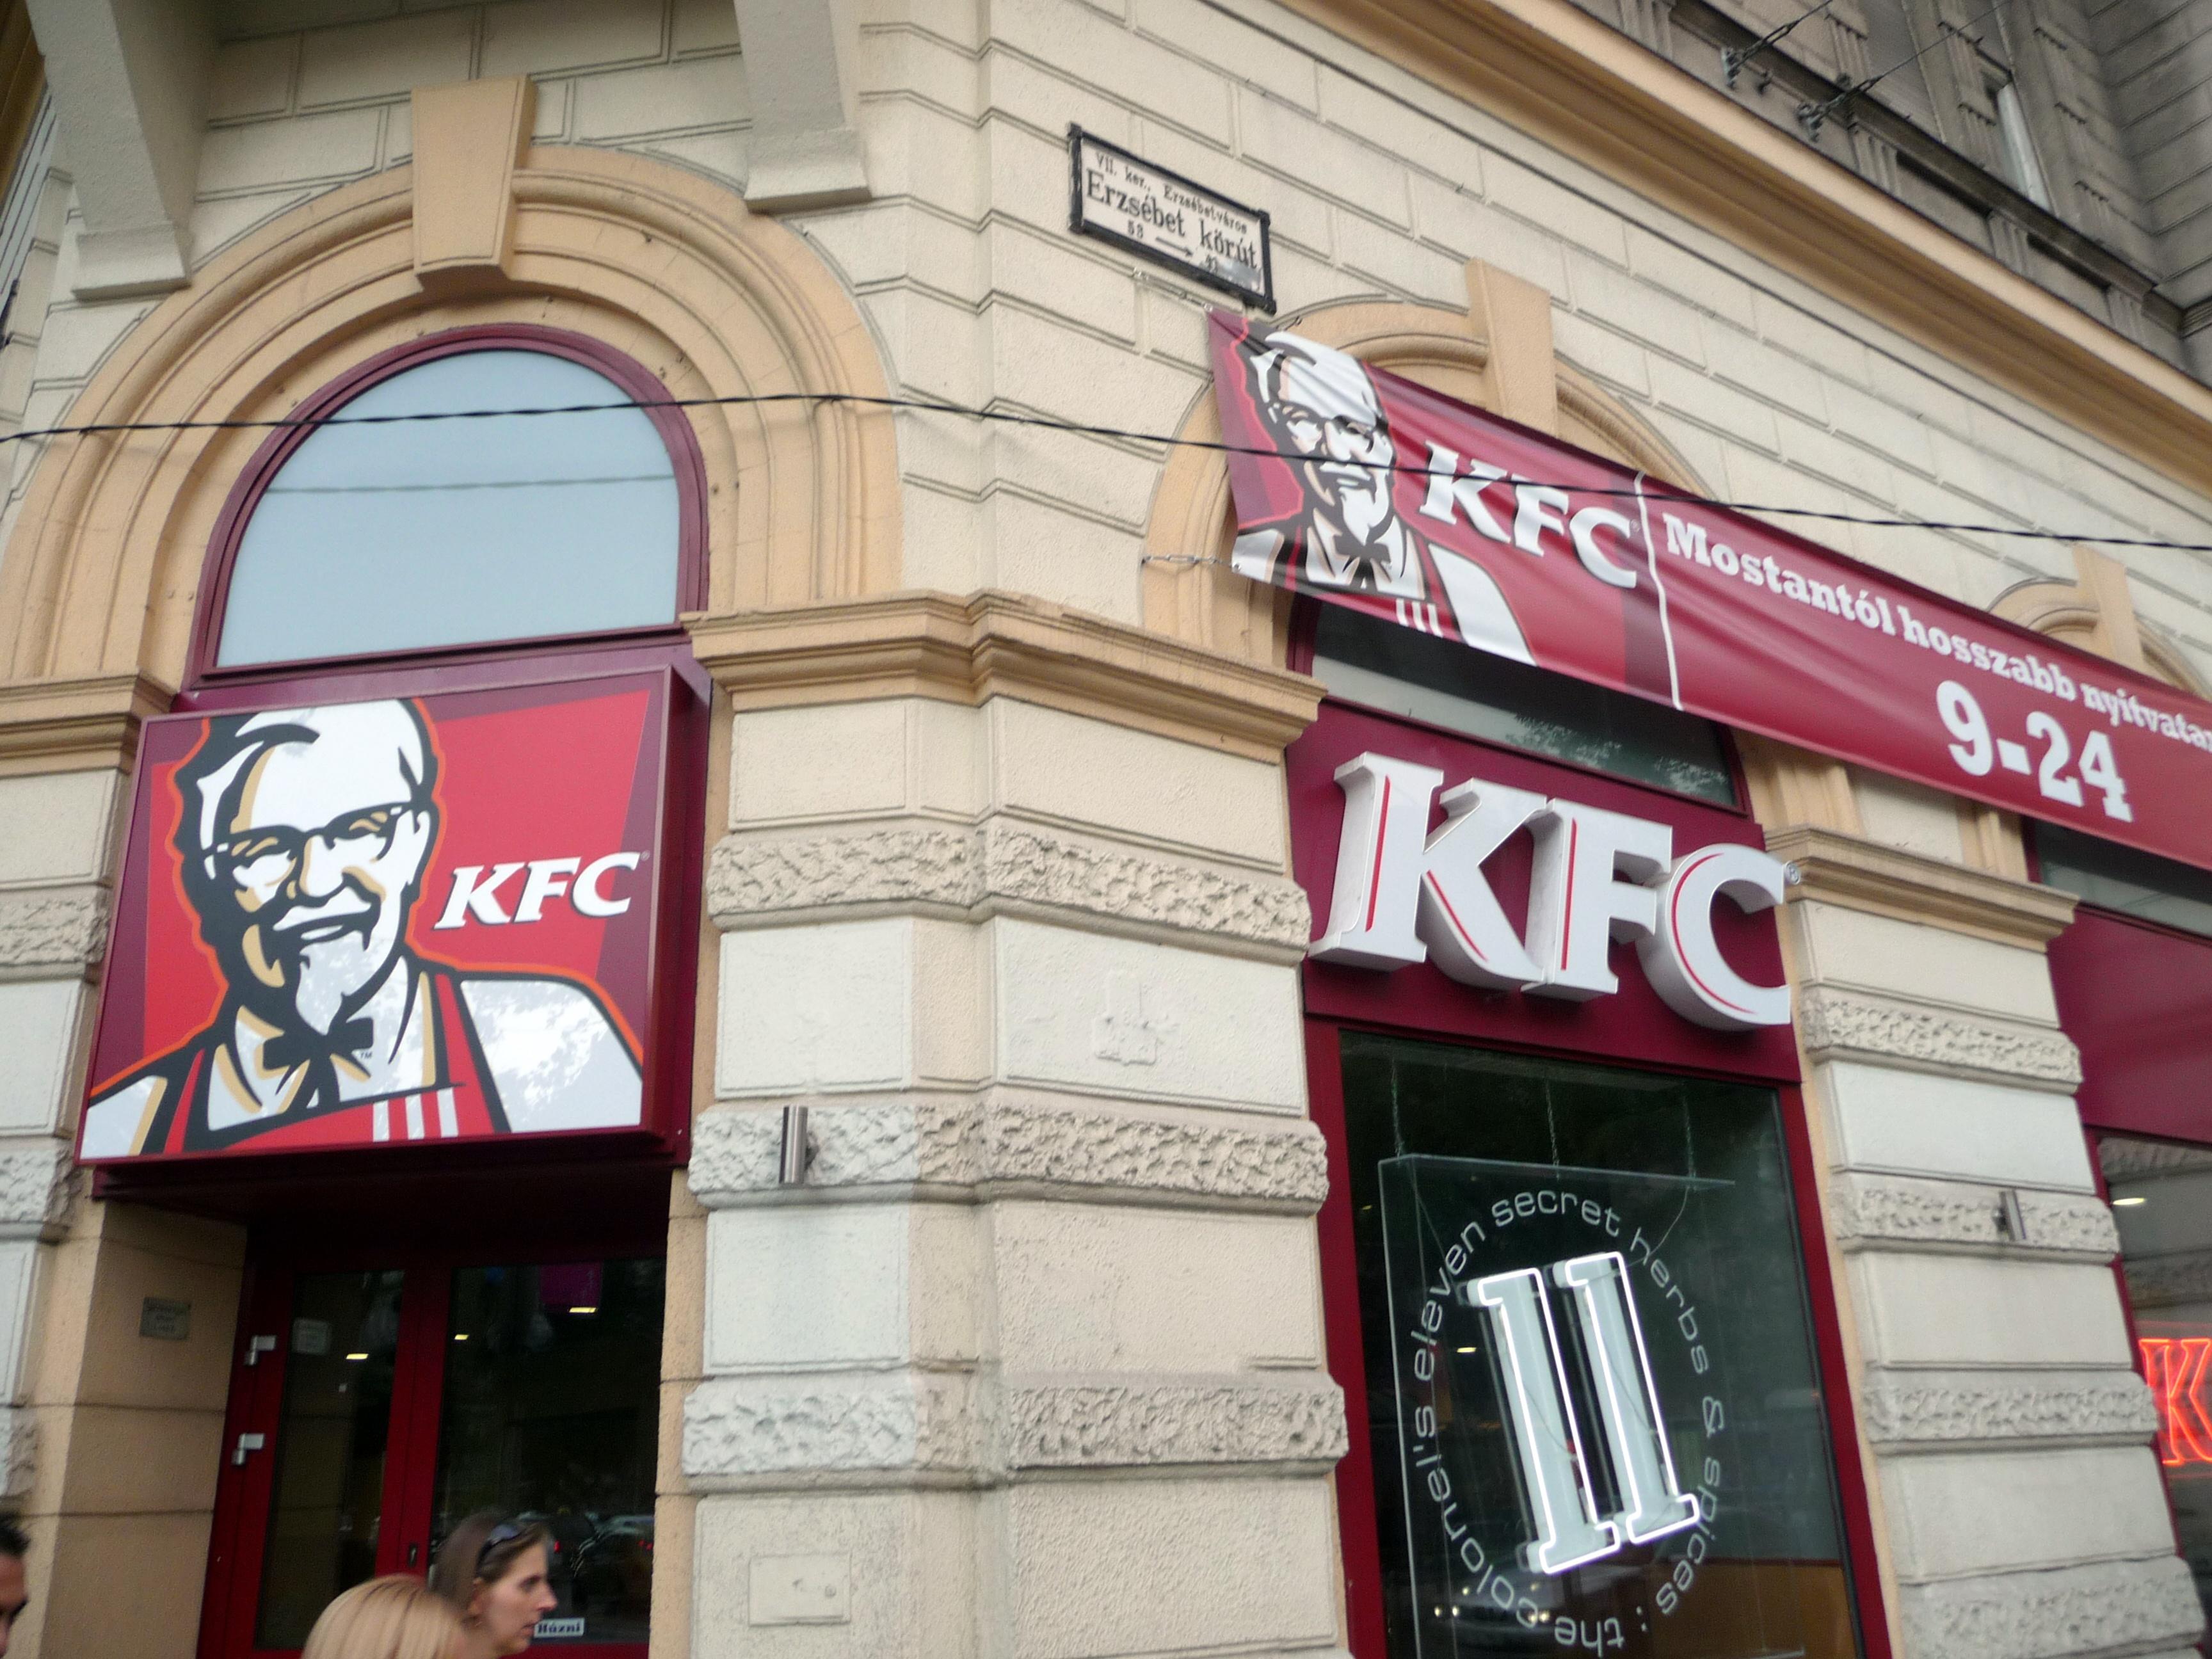 budapest_kfc_restaurant.jpg